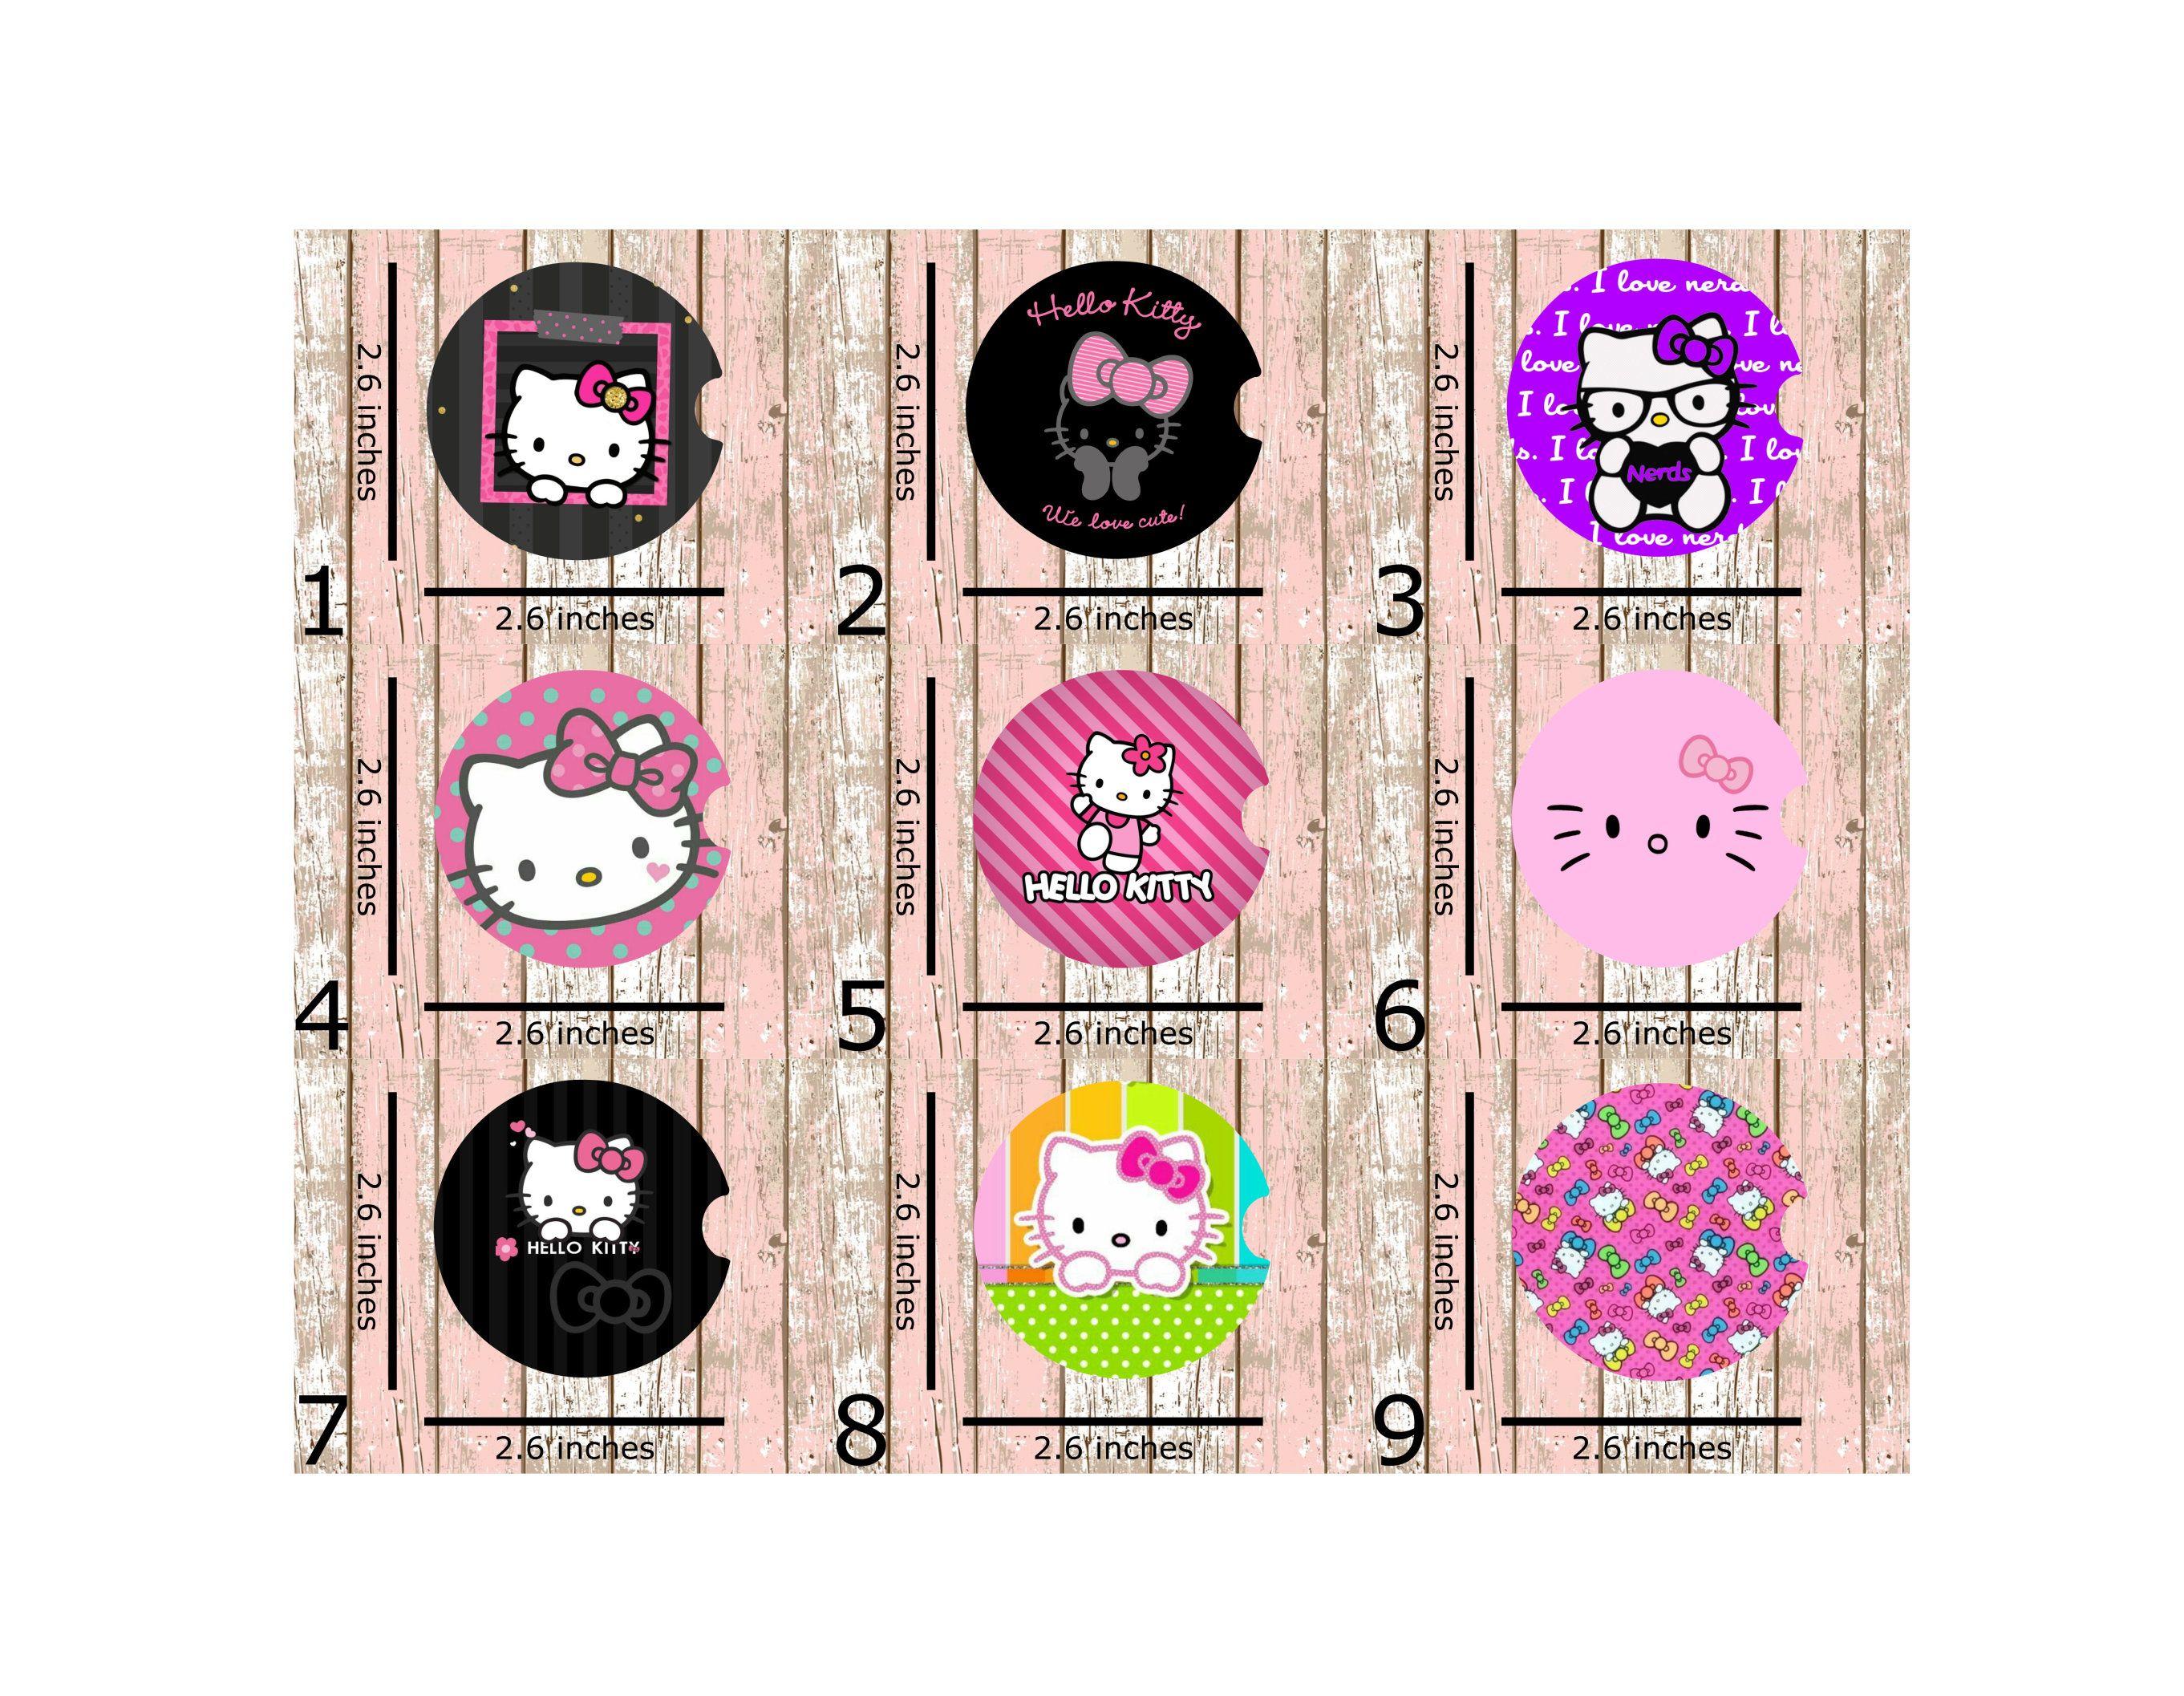 Hello Kitty Print Sublimation Car Coaster Set Includes 2